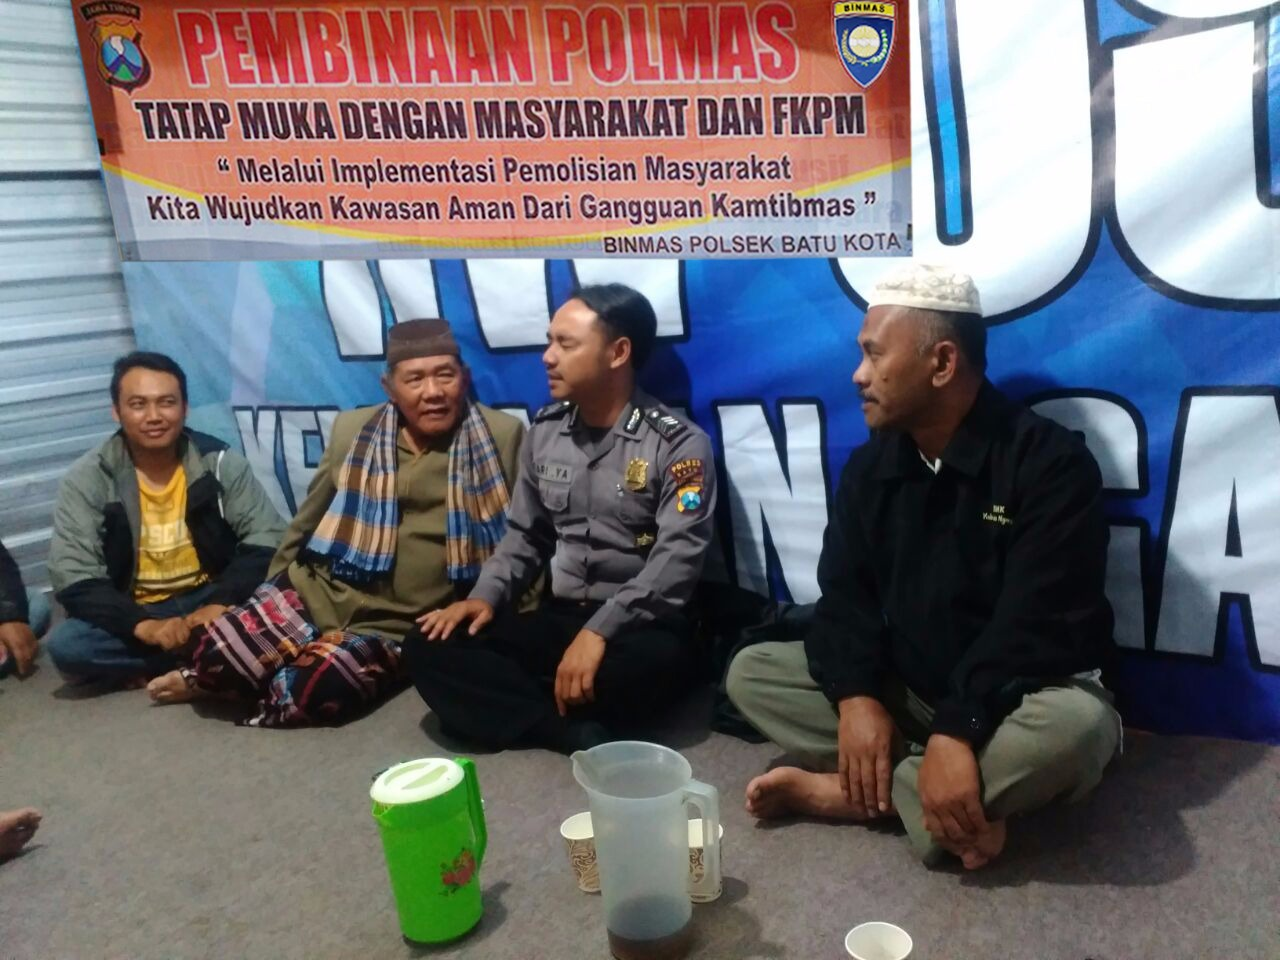 Brigadir Ari Bhabinkamtibmas Kel. Ngaglik Polres Batu Kota Polres Batu Lakukan Tatap Muka Kepada Masyarakat dan FKPM laksanakan DDS